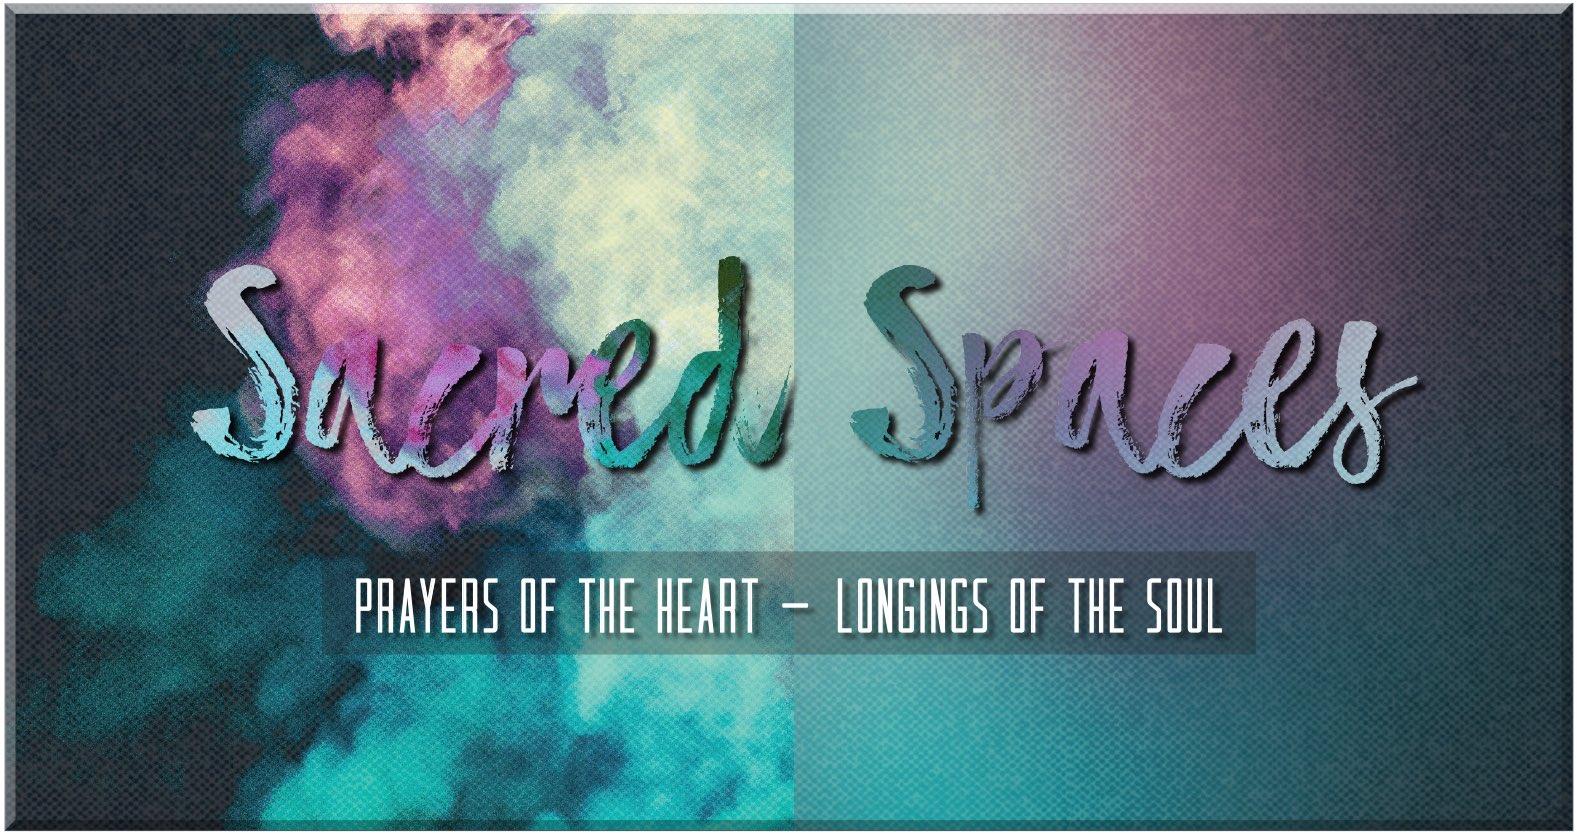 New 2018 sermon series